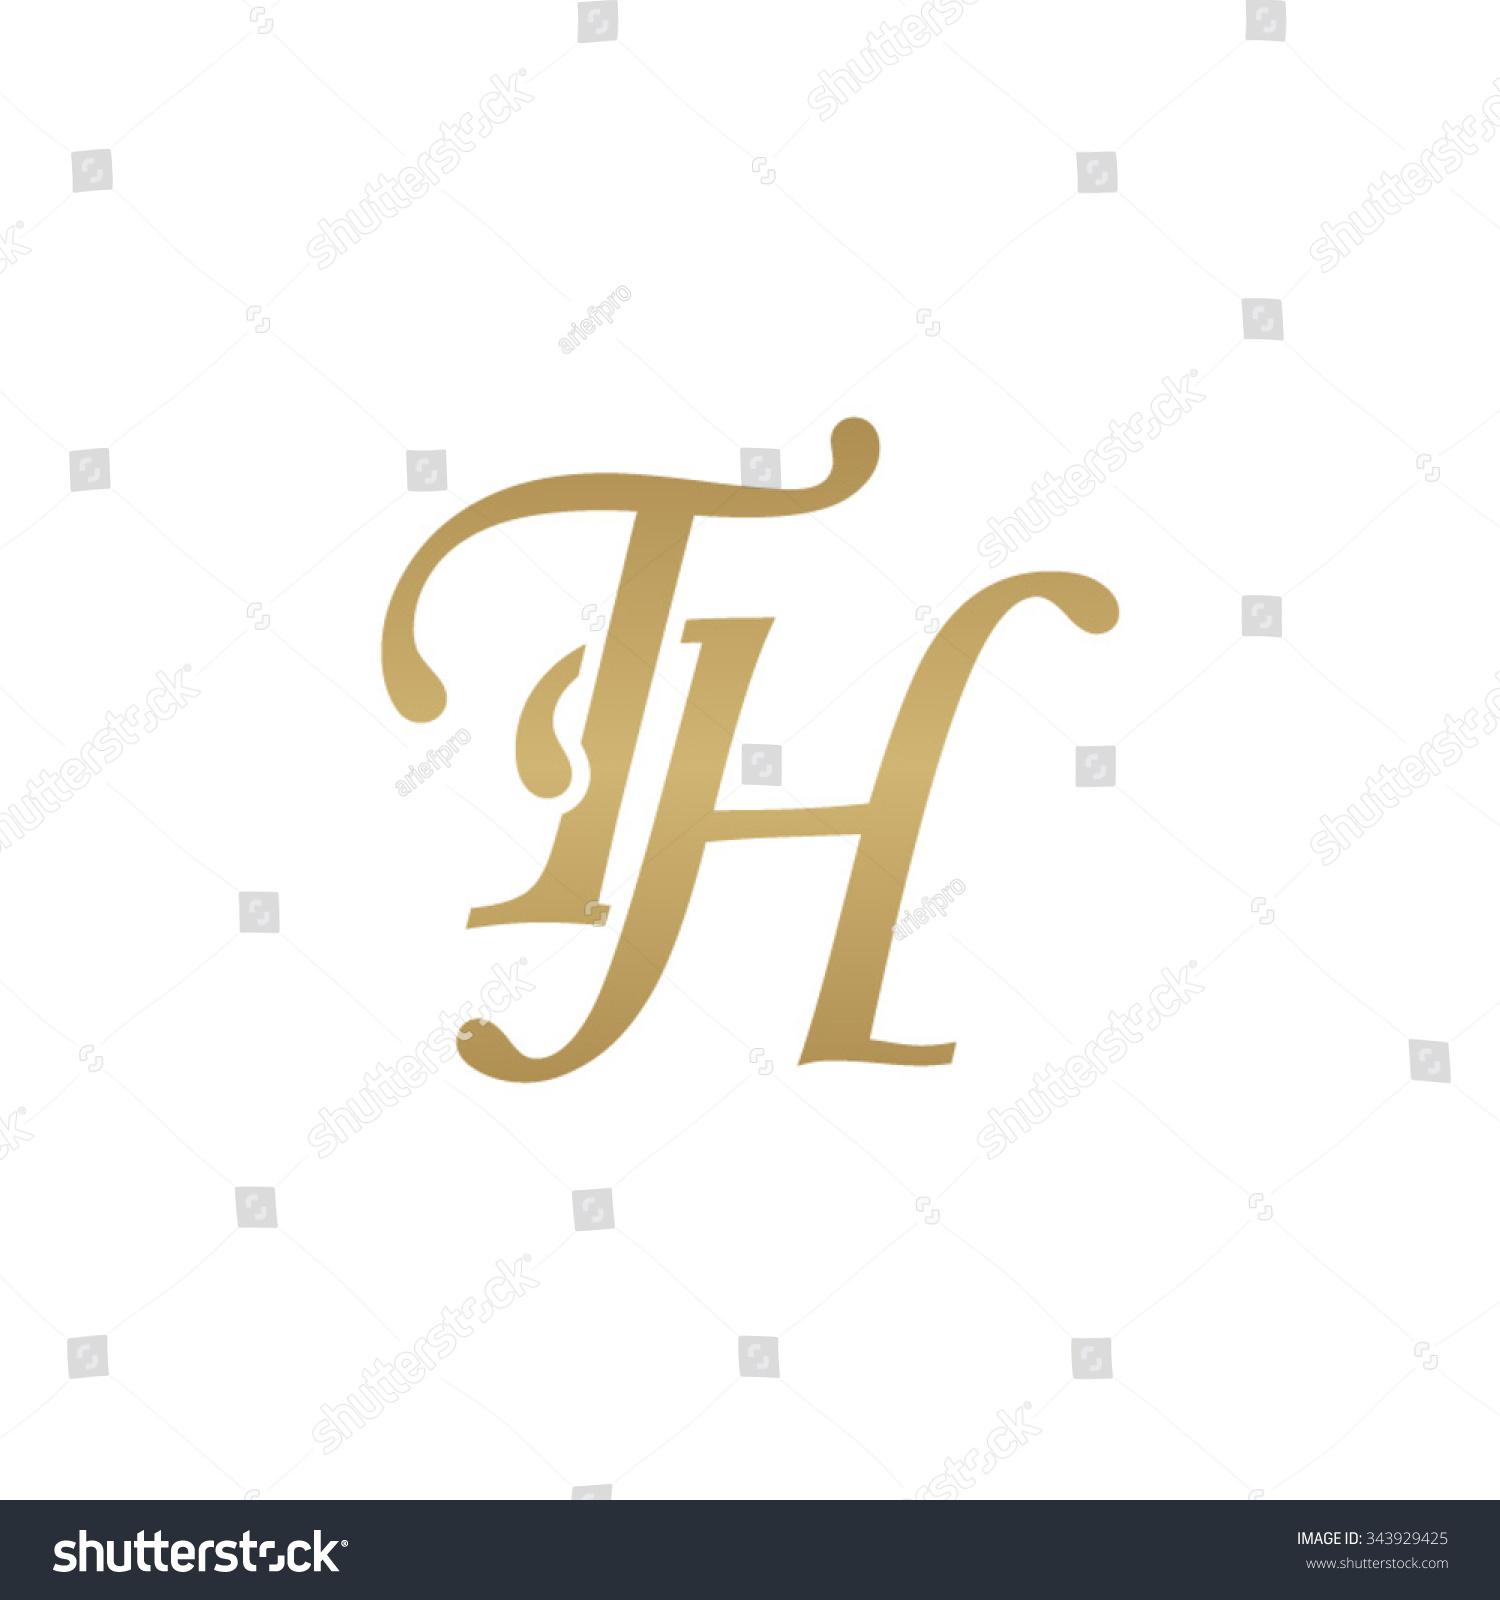 Tj initial luxury ornament monogram logo stock vector - Th Initial Monogram Logo